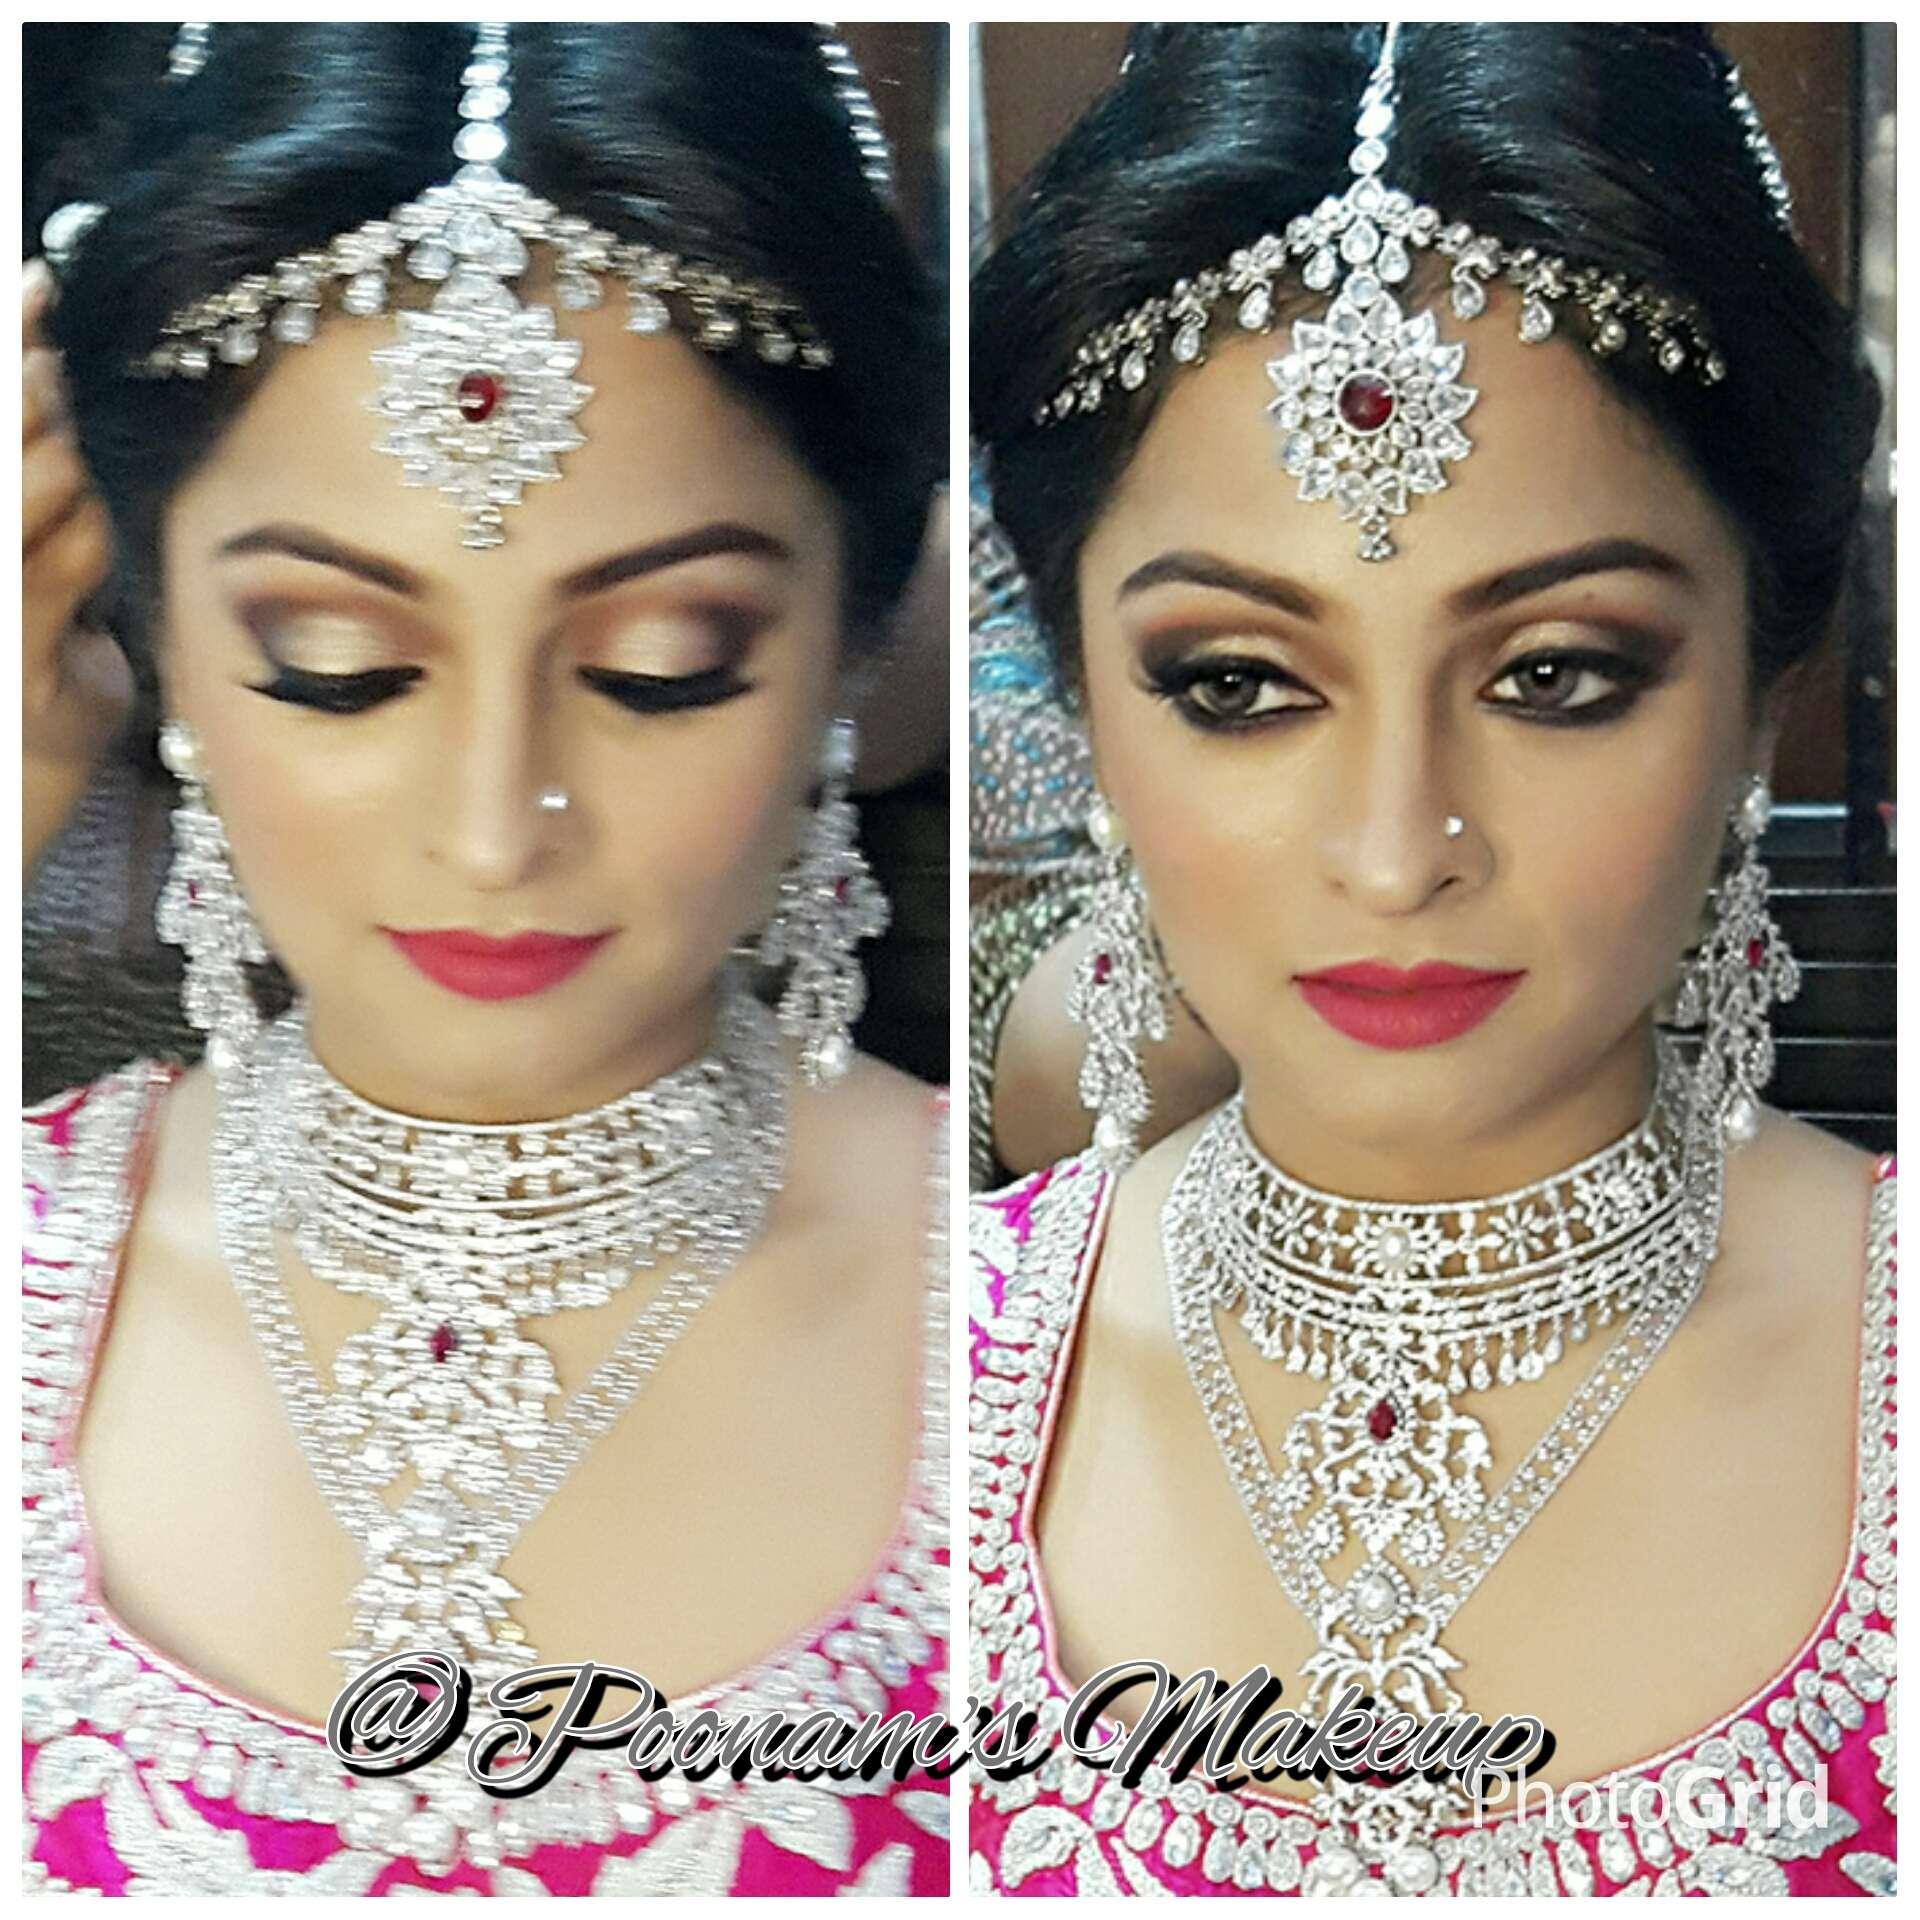 Portfolio - Poonam Shah's Professional Makeup & Hairstyling